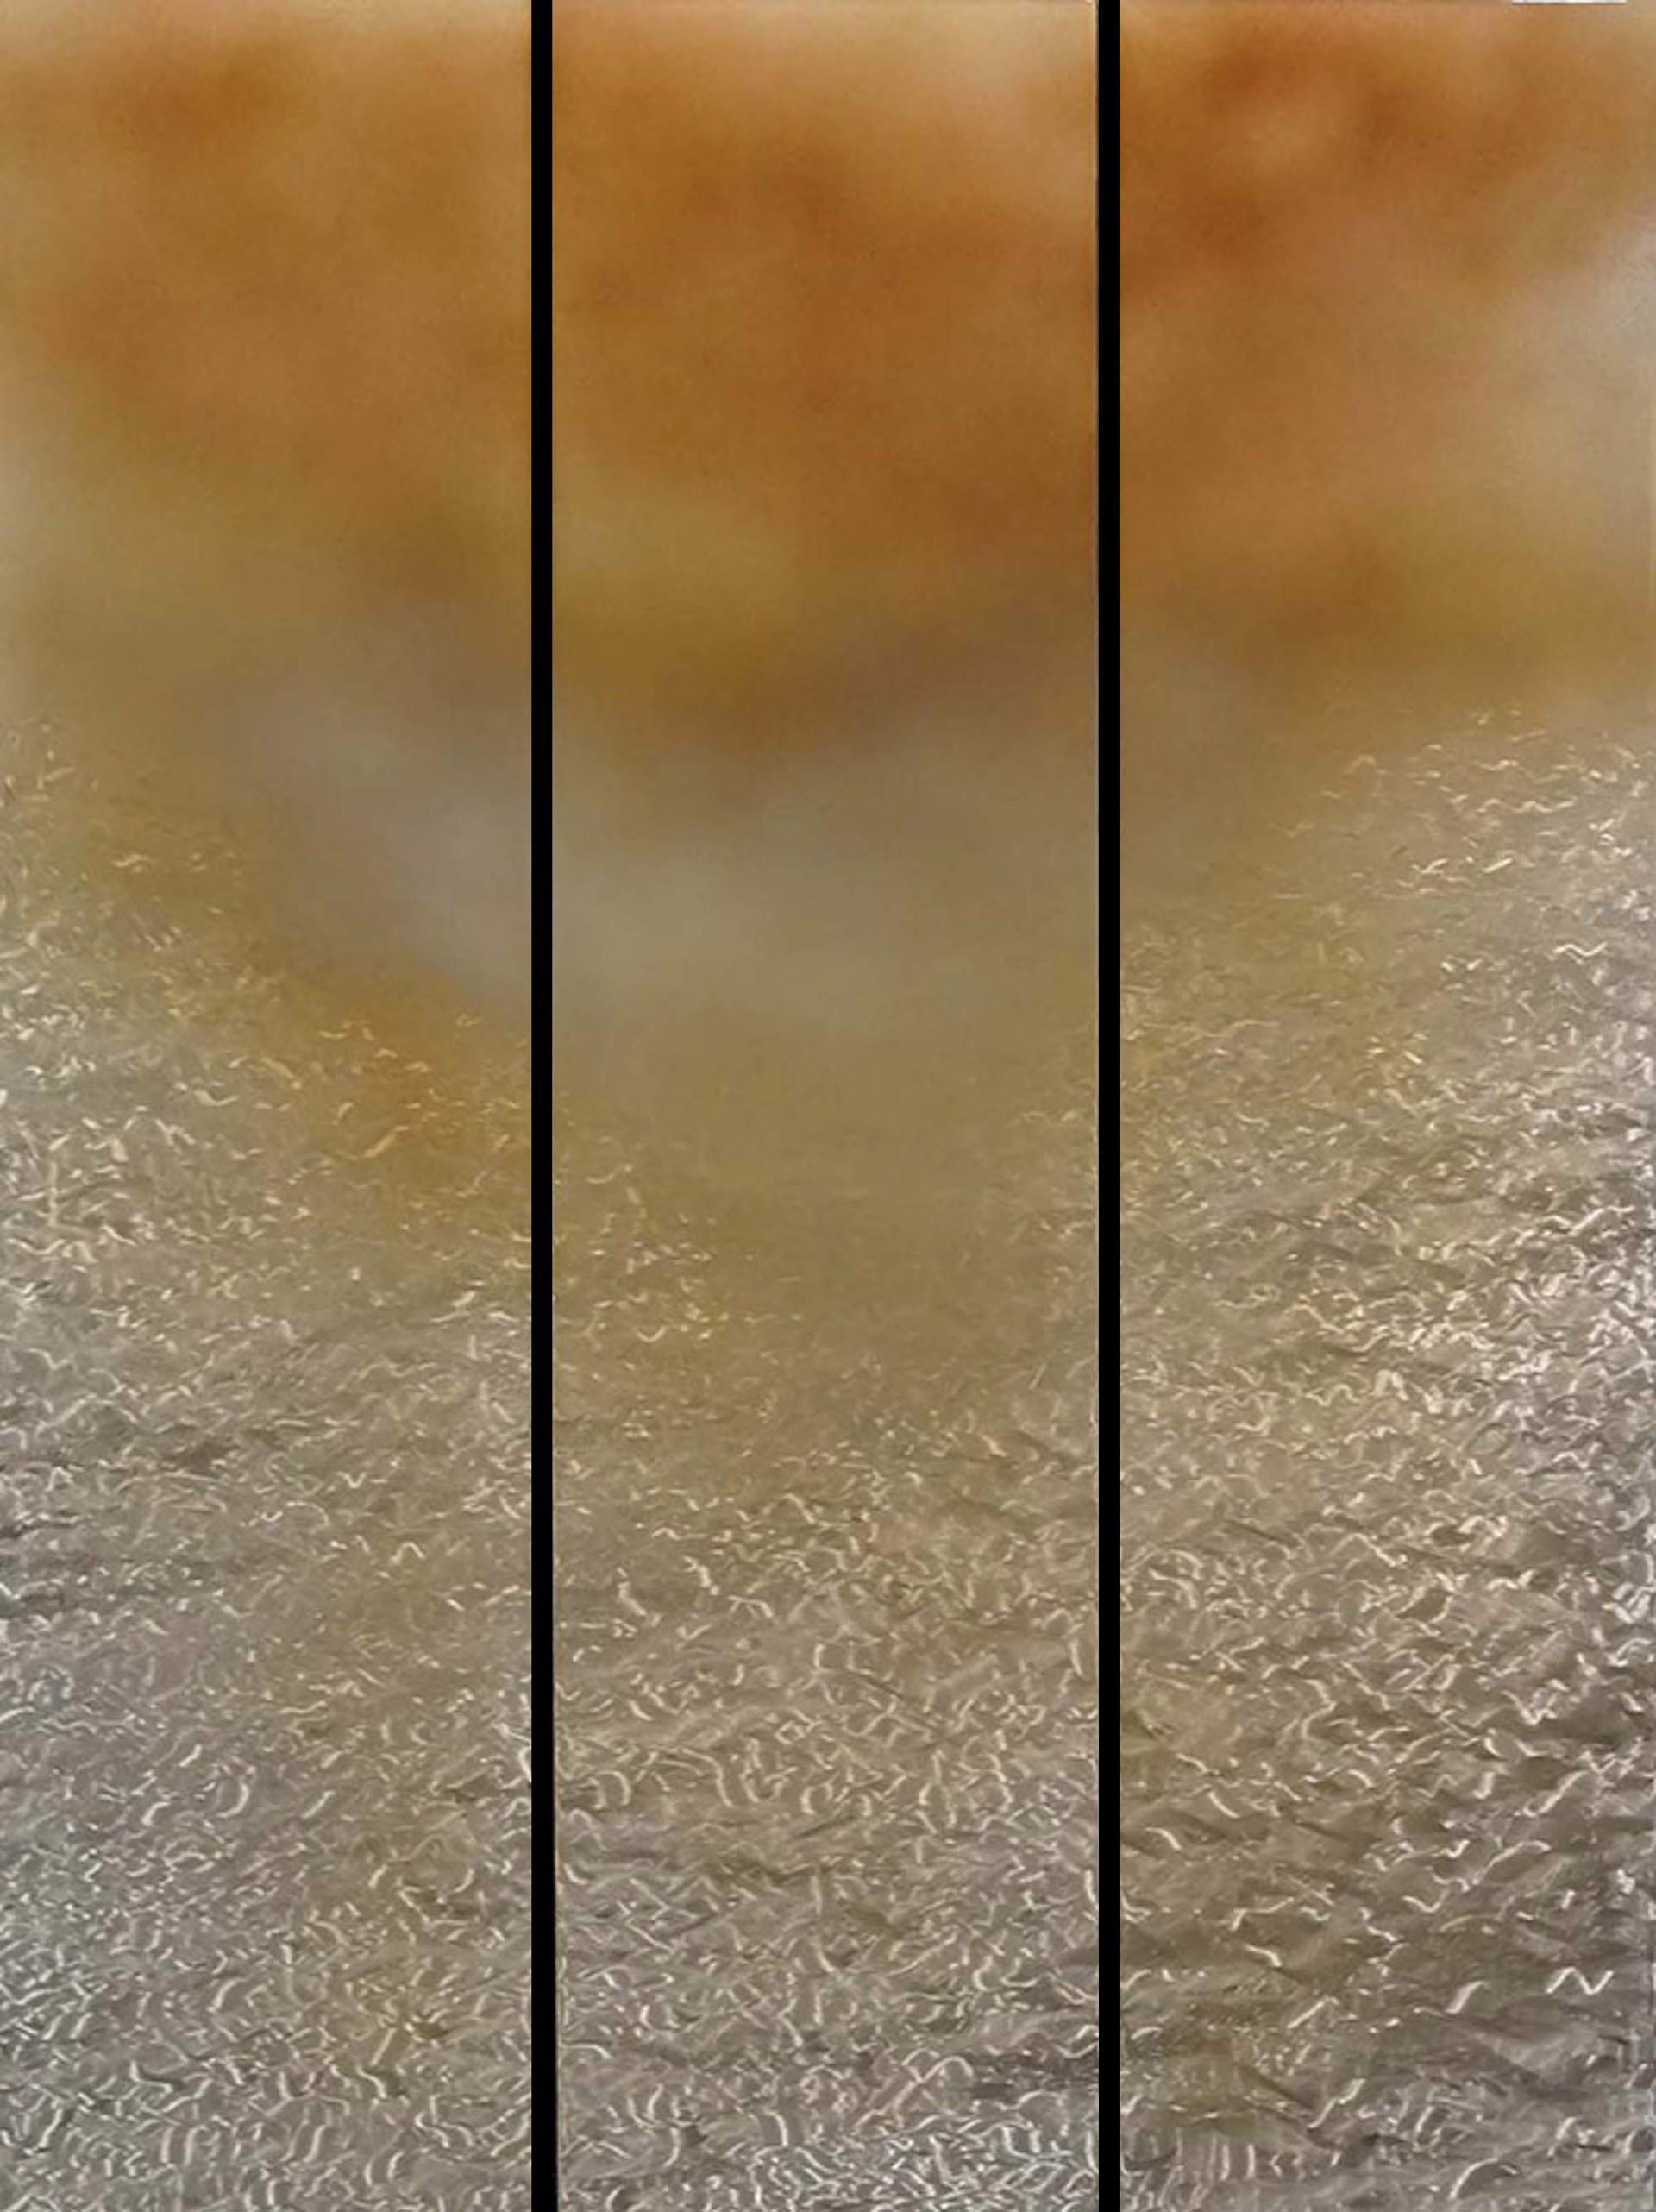 Ruffling Waters - O by Lori Wylie